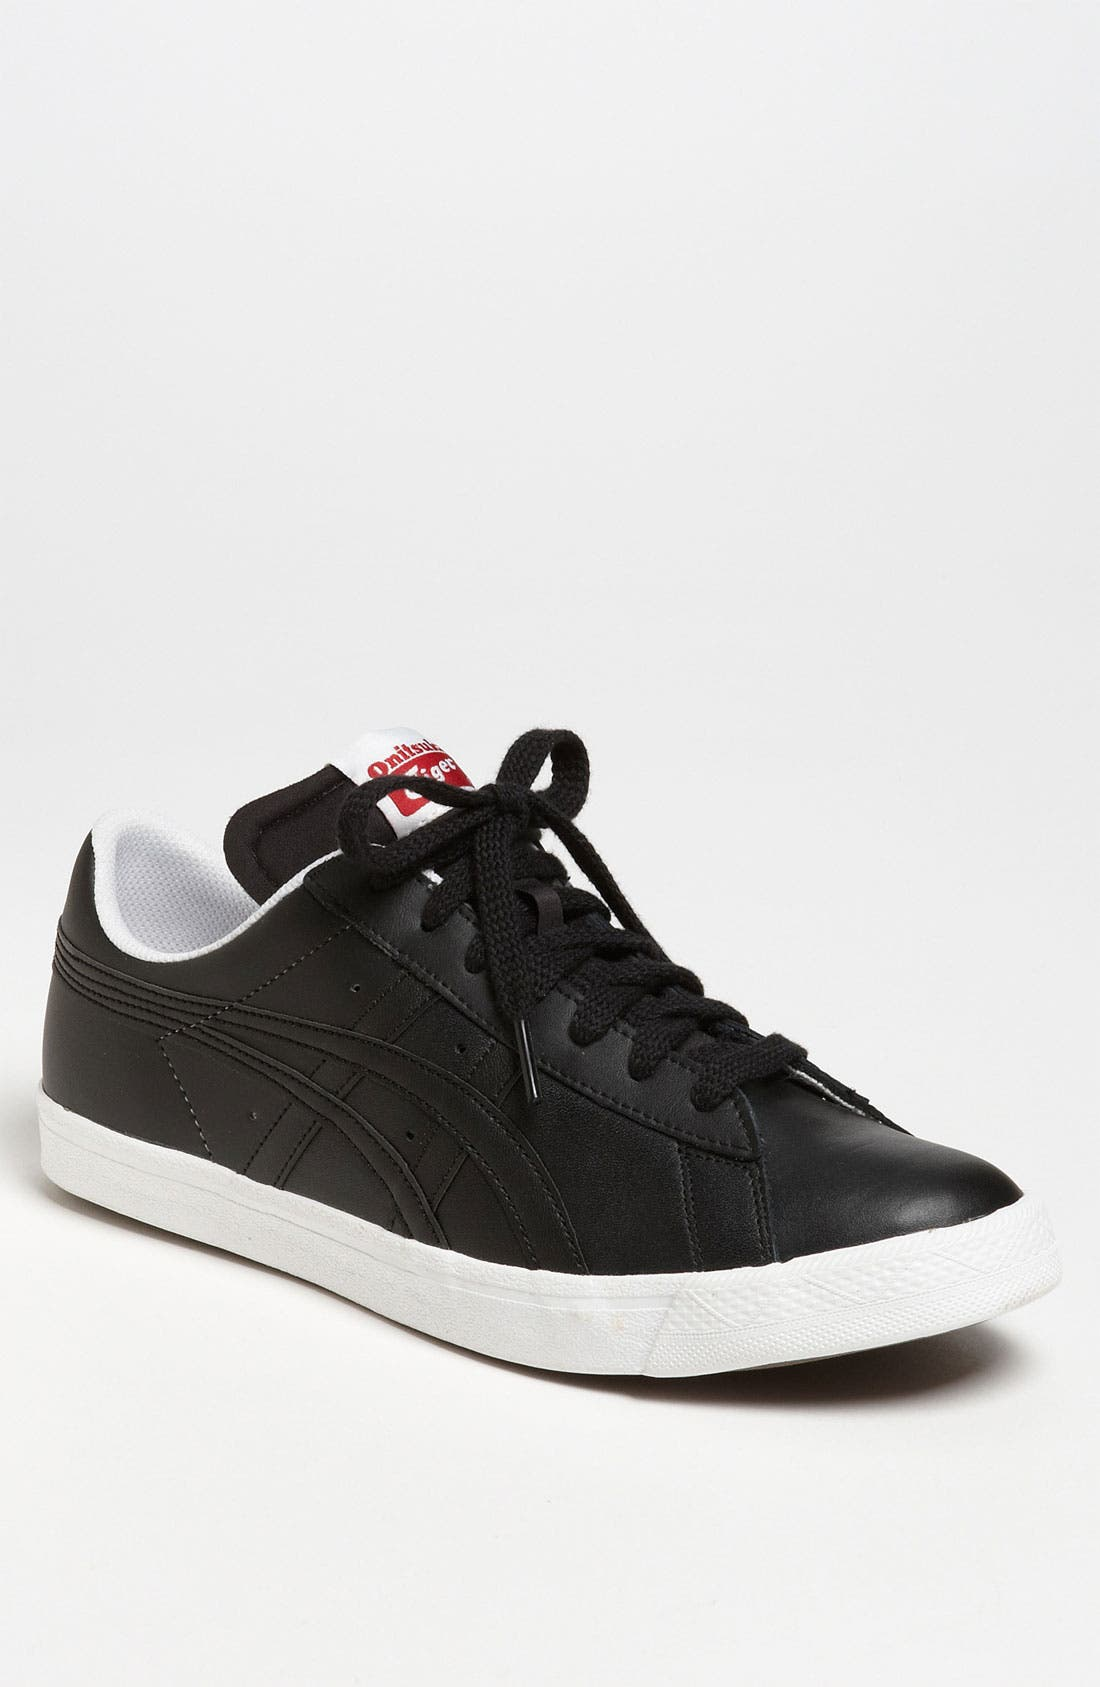 Alternate Image 1 Selected - Onitsuka Tiger™ 'Fabre' Sneaker (Men)